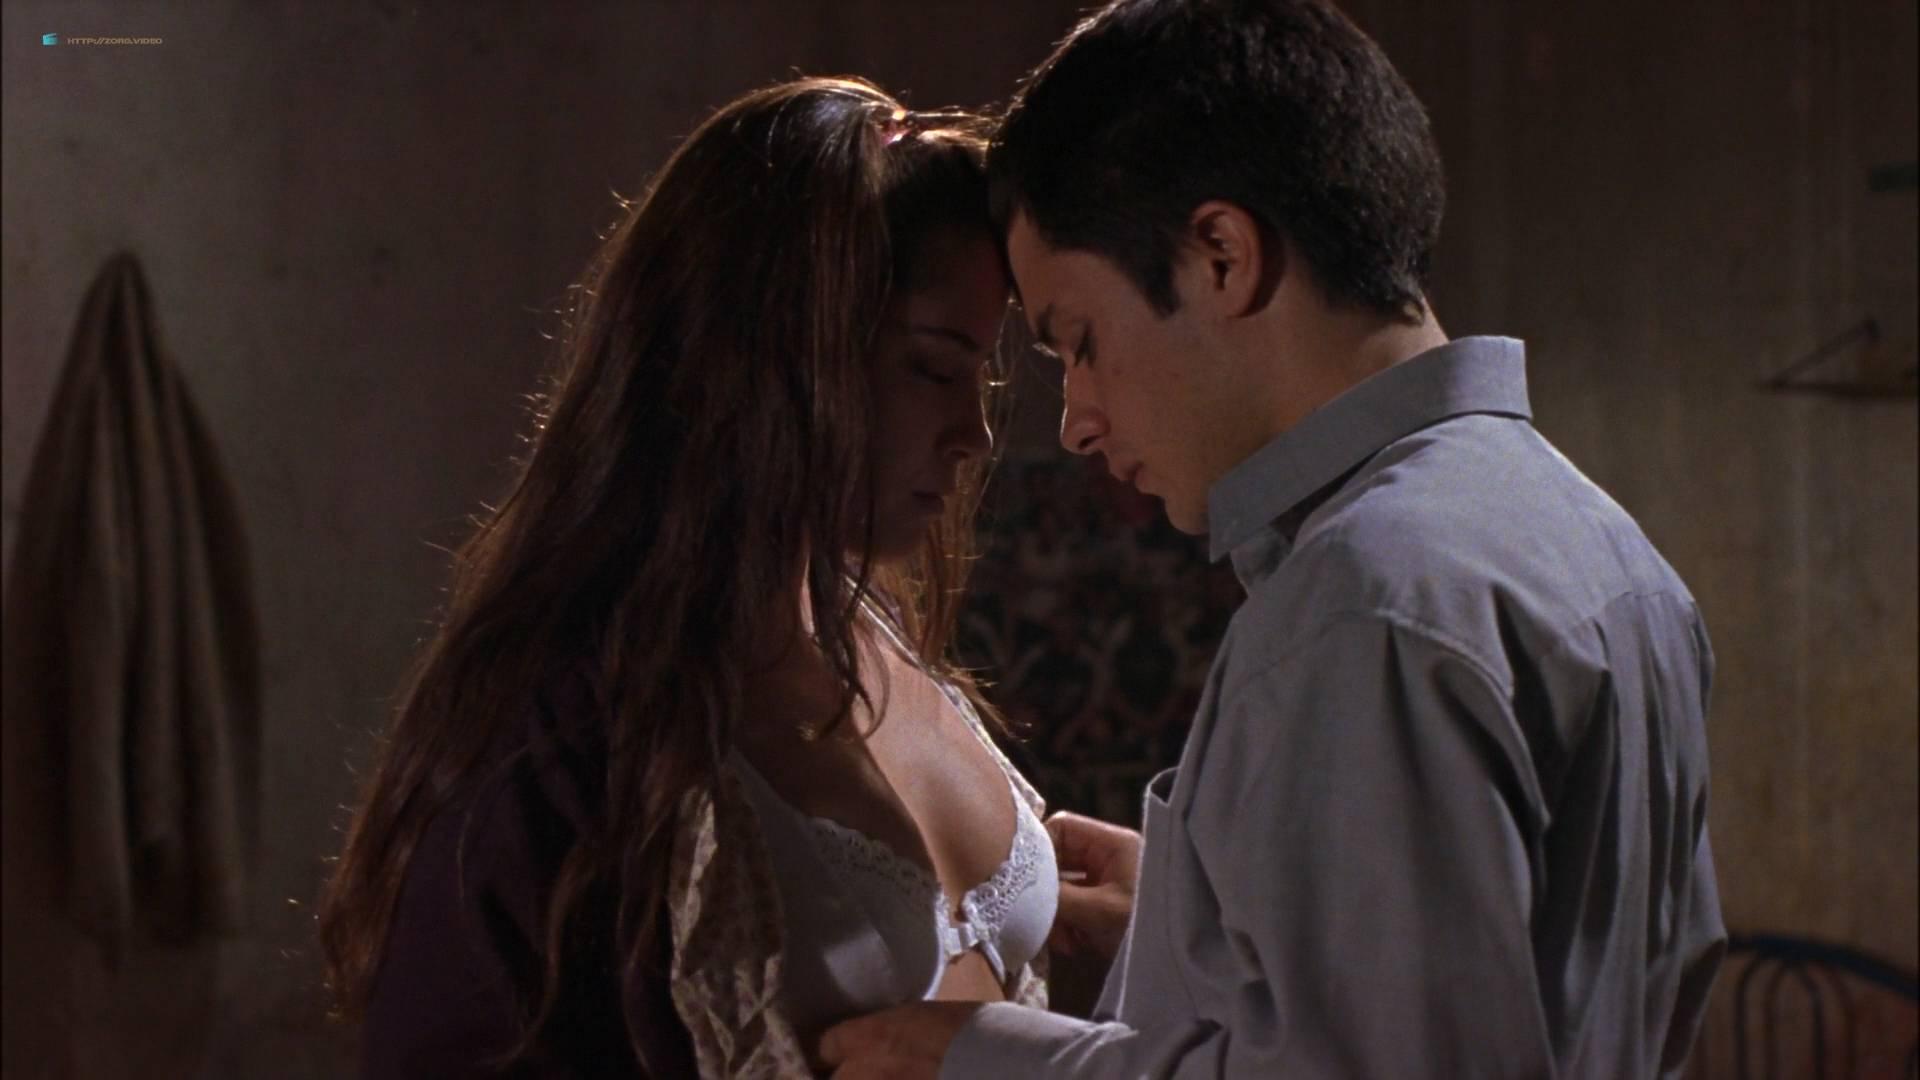 Ana Claudia Talancón nude topless in sex scene - The Crime of Padre Amaro (MX-2002) HD 1080p Web (11)